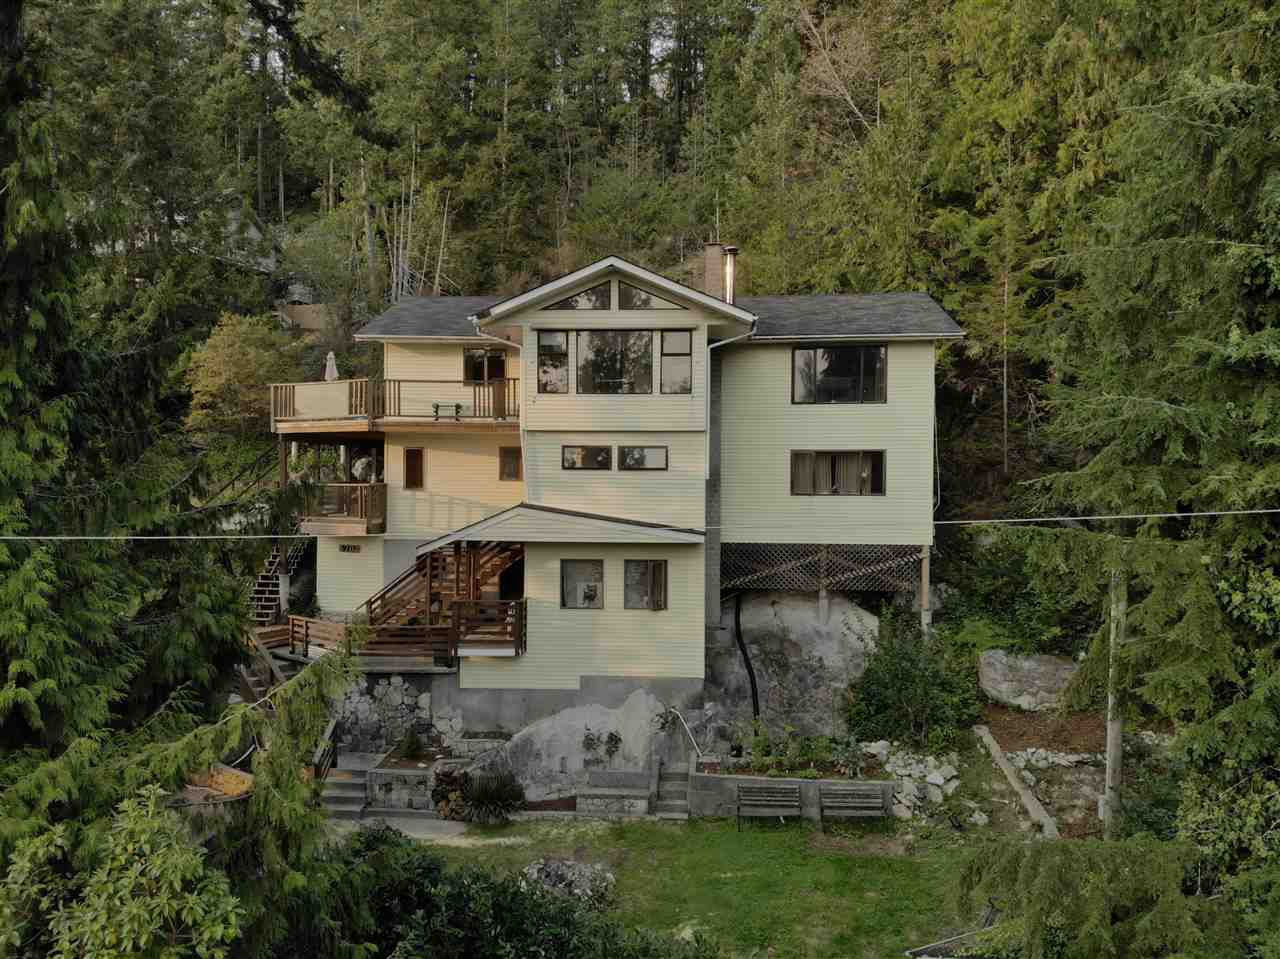 Main Photo: 5704 CARMEL Place in Sechelt: Sechelt District House for sale (Sunshine Coast)  : MLS®# R2504728